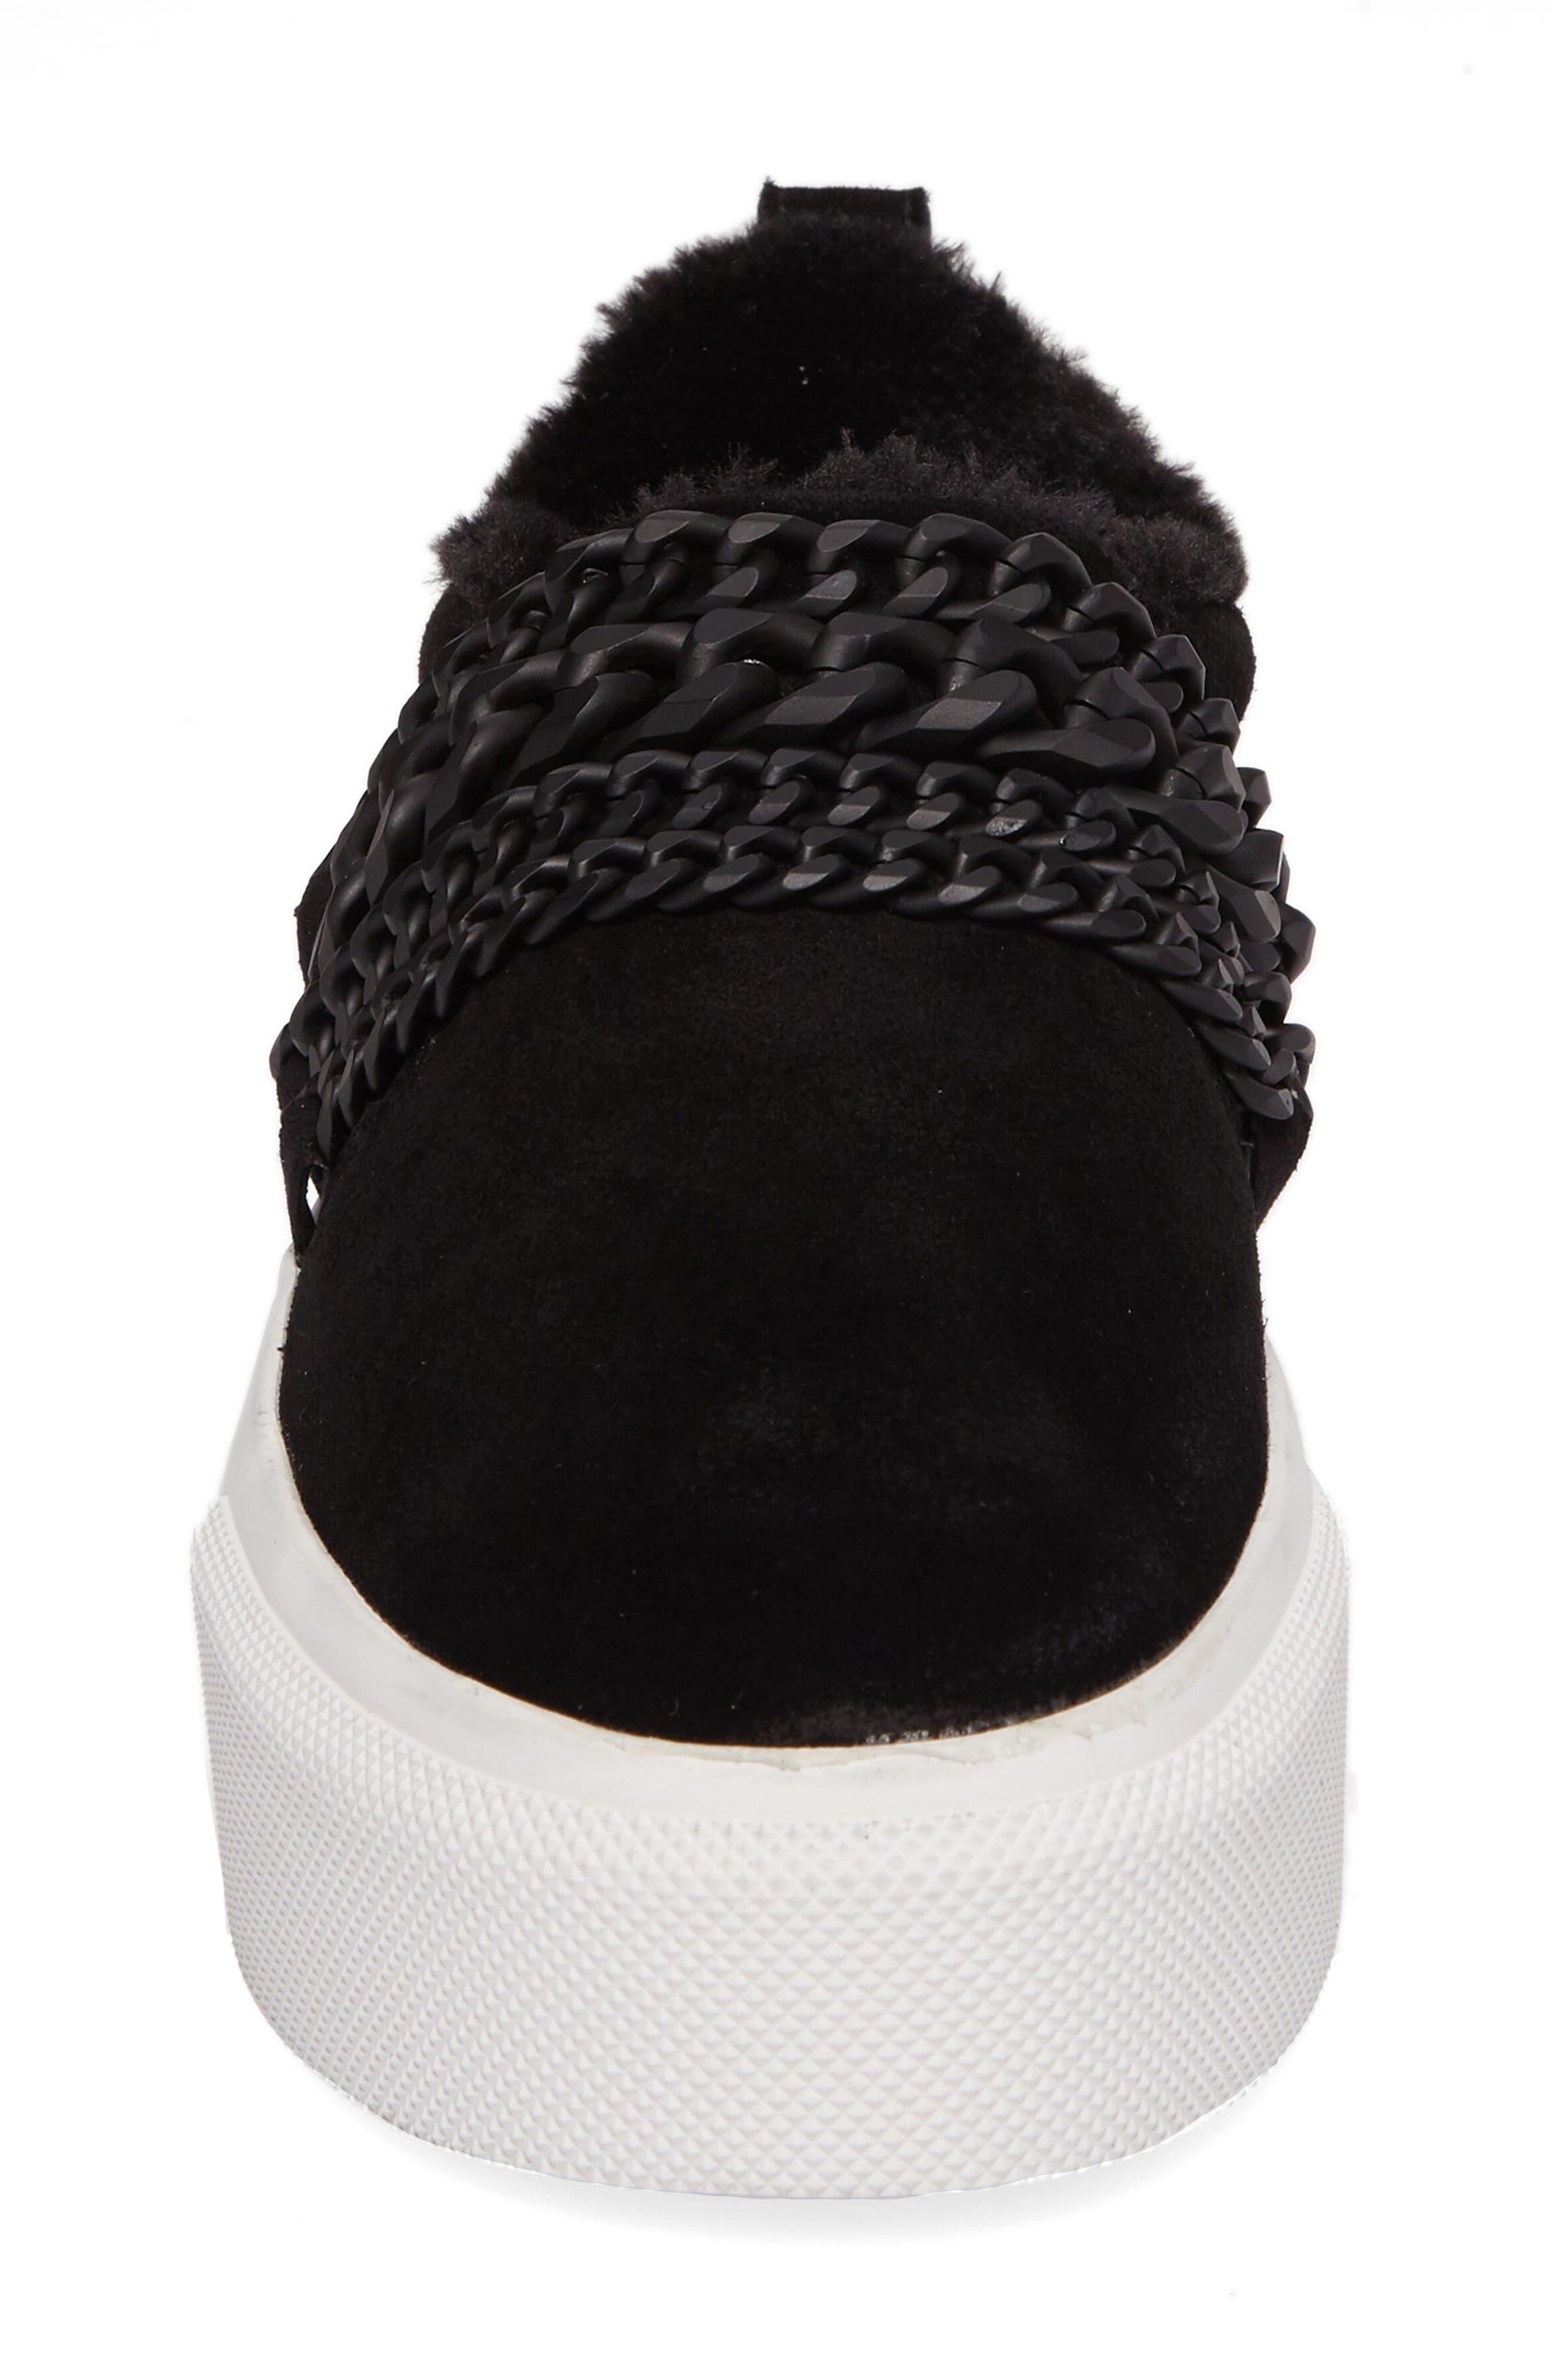 Tory Platform Sneaker,                             Alternate thumbnail 4, color,                             Black